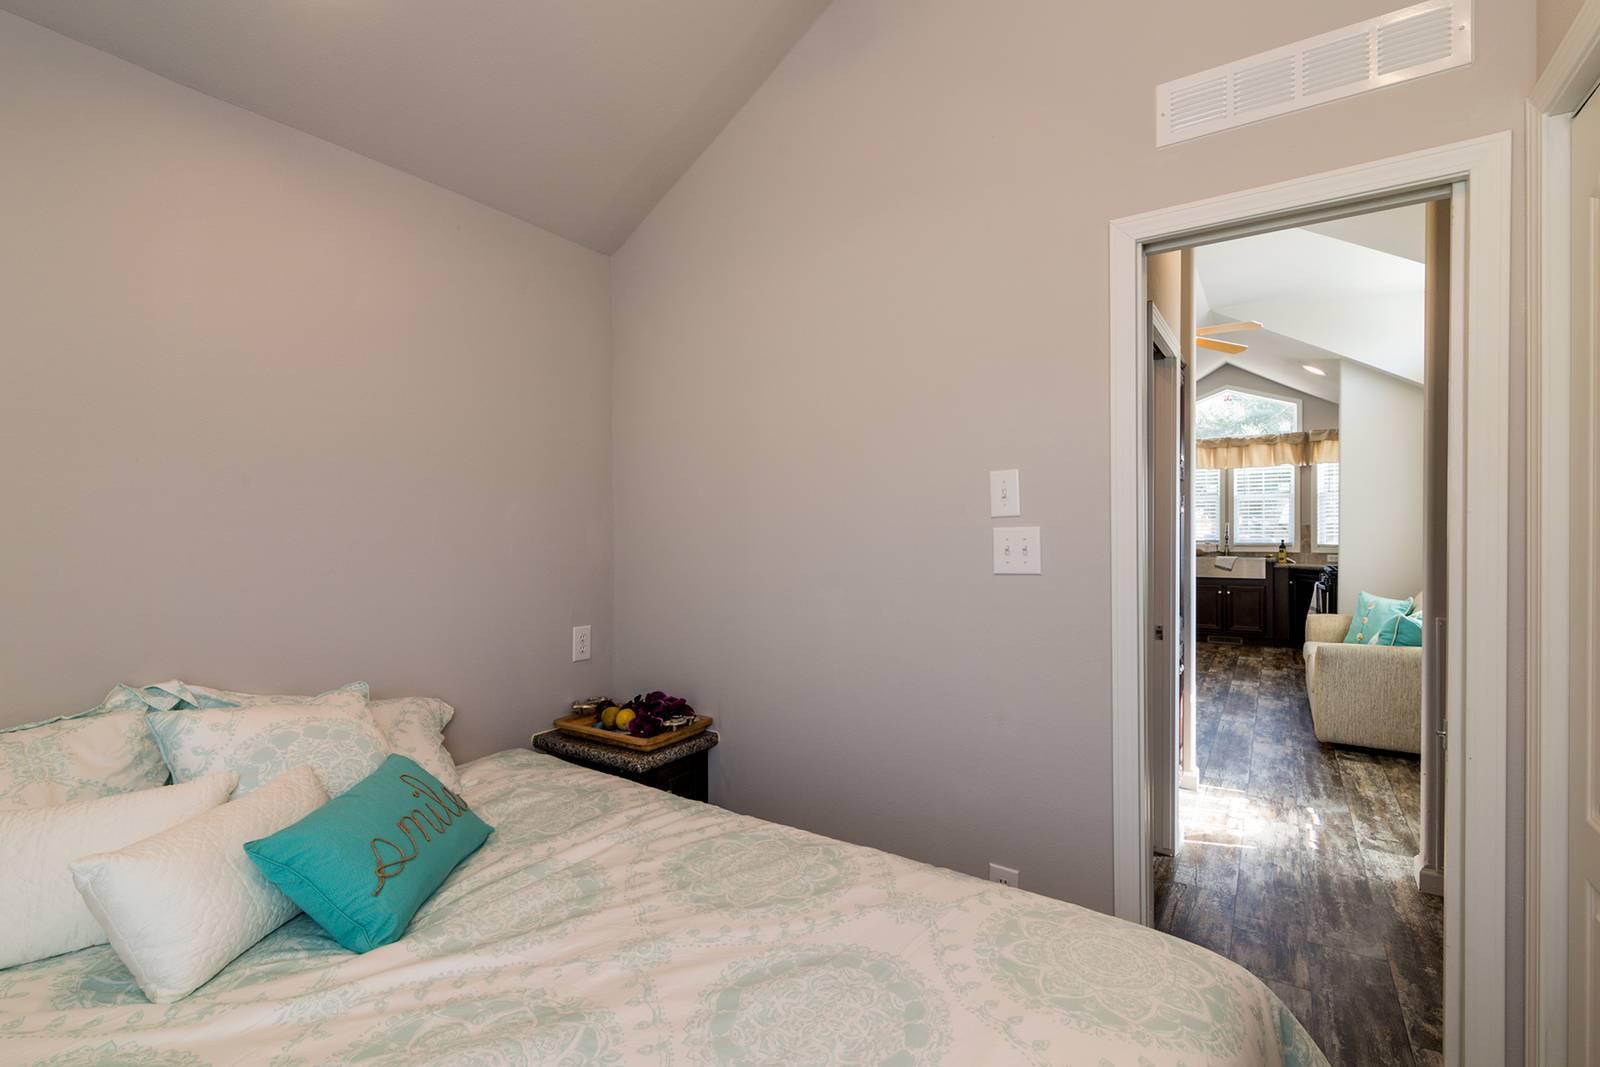 Park Model RV / APH 518 - Bedroom